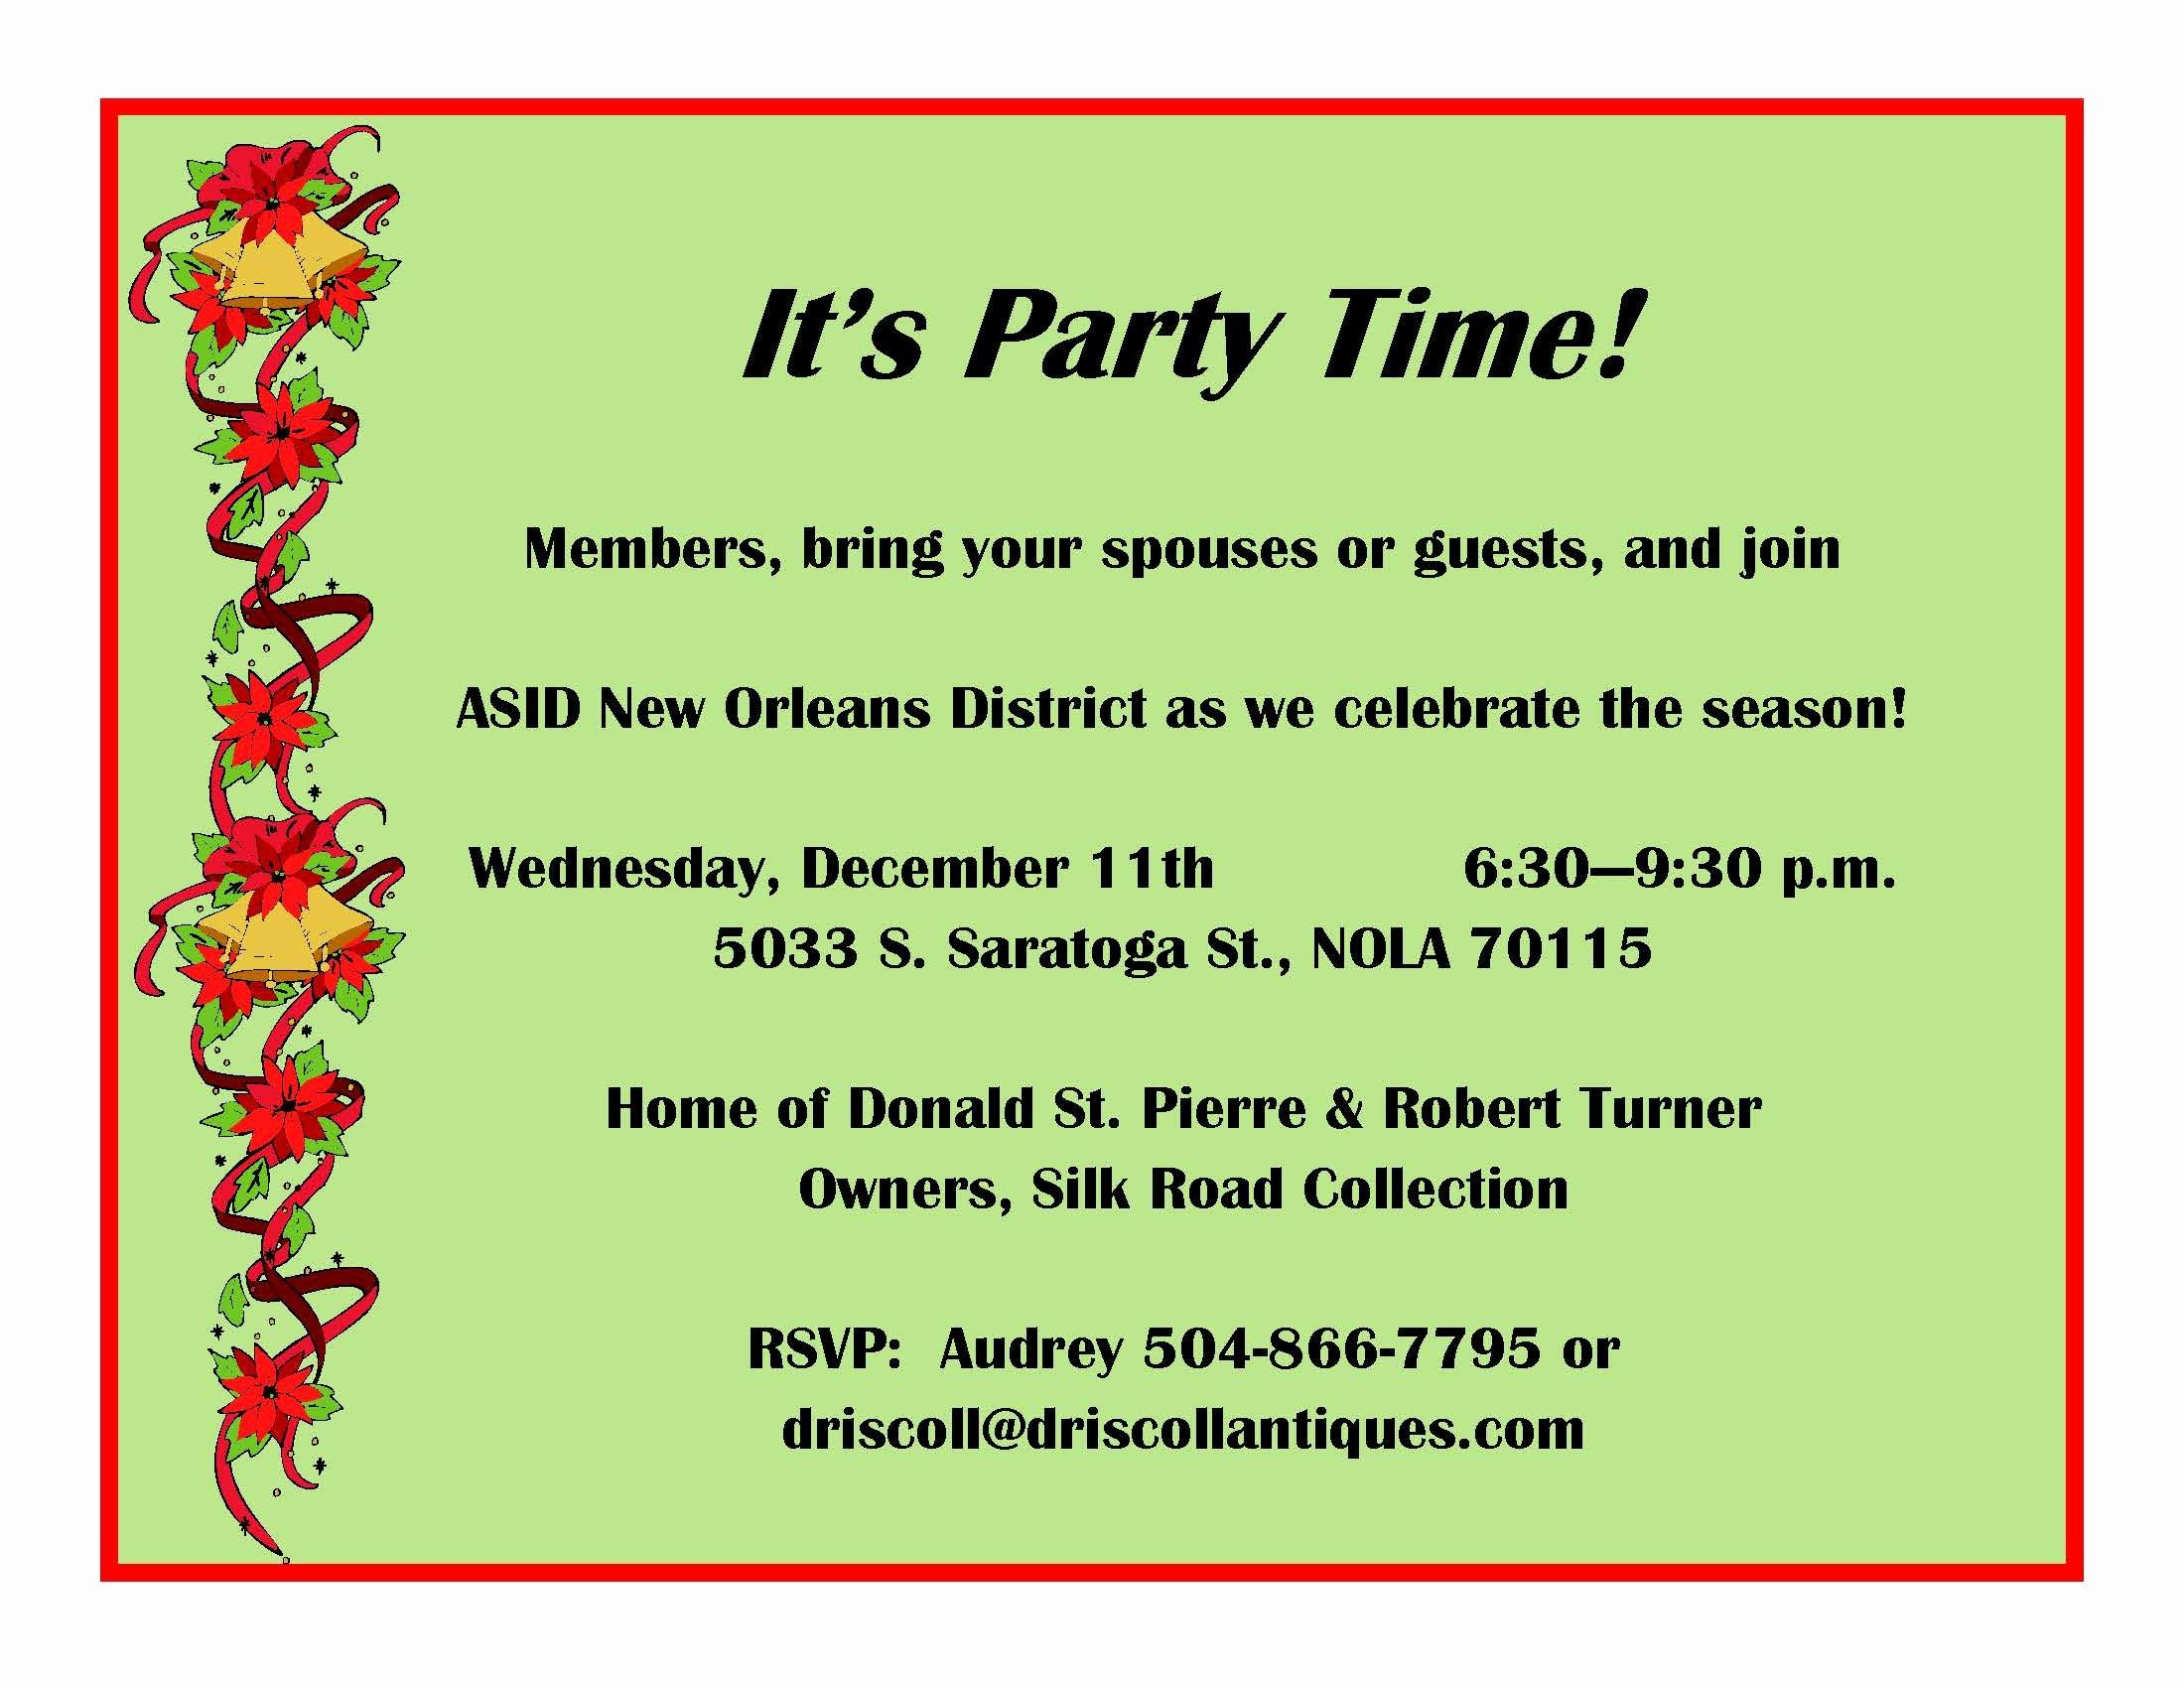 Birthday Invitation Email Template Elegant Party Invitation Templates Email Party Invitations